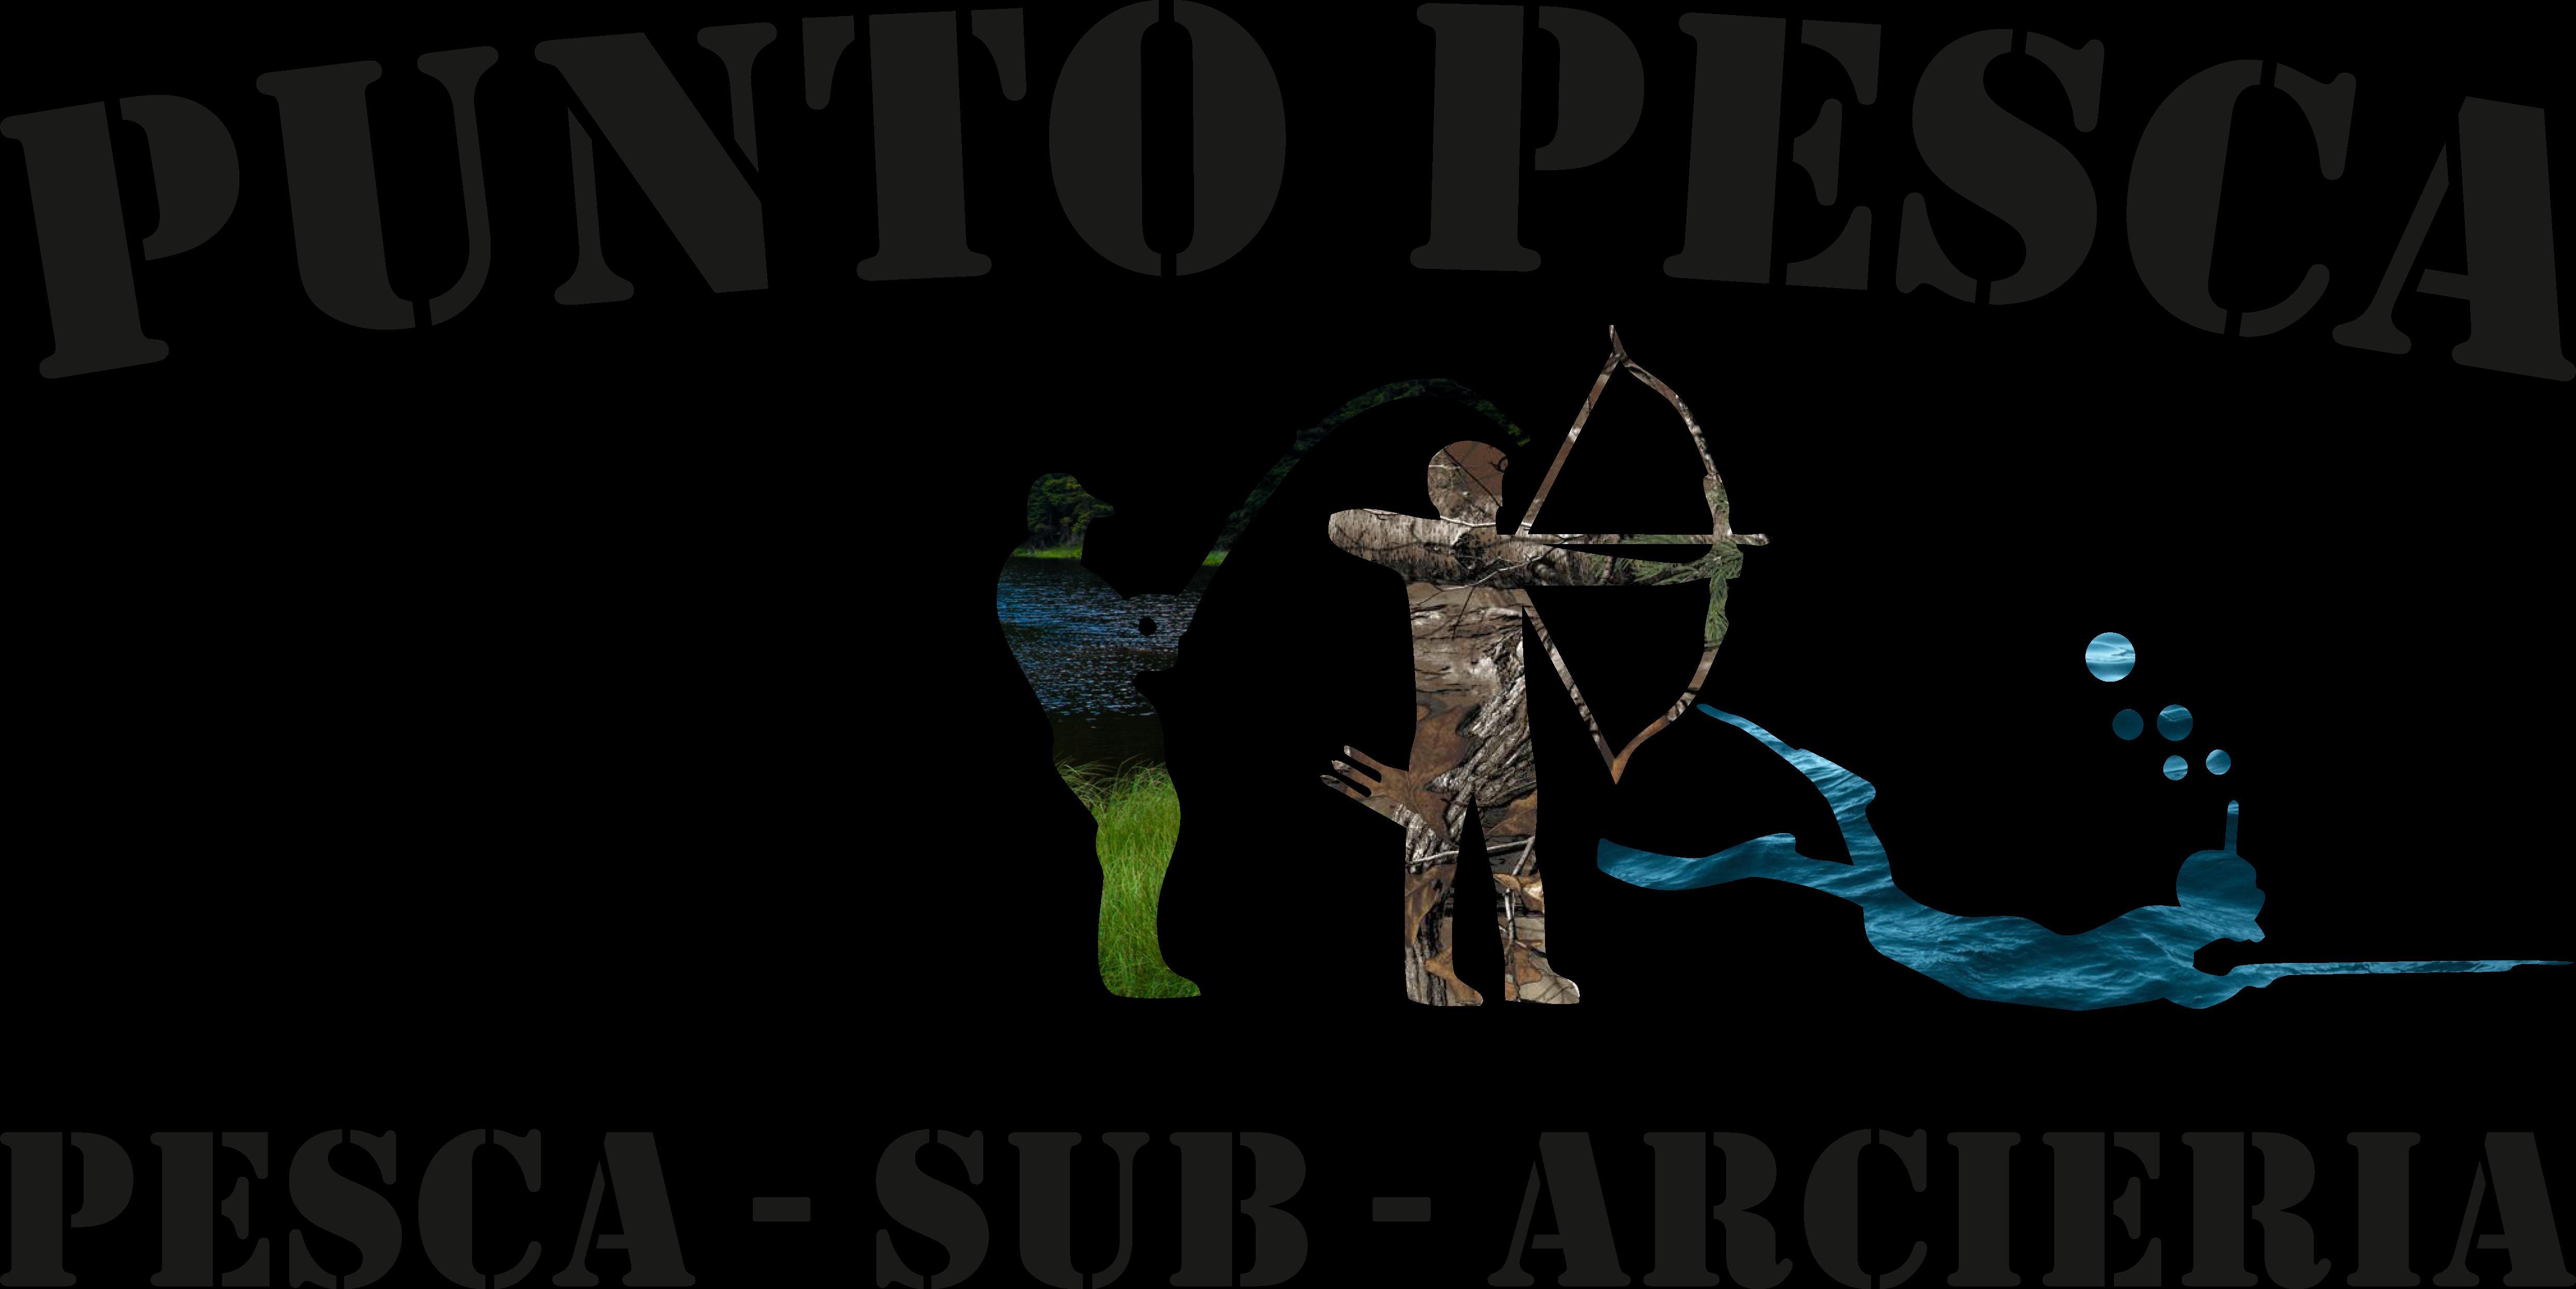 Punto Pesca Sub